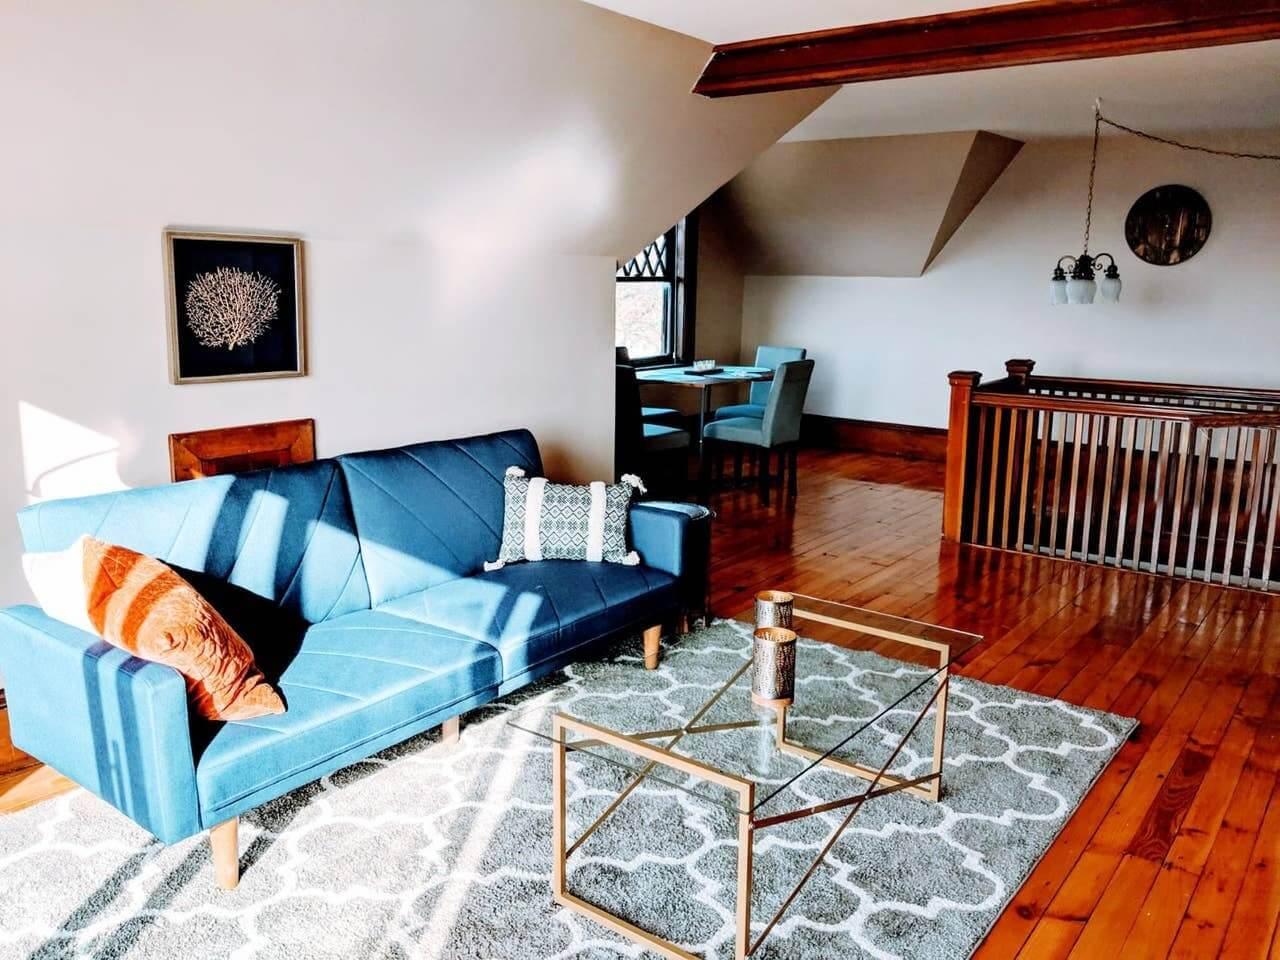 2 Bedroom Apartment at English Tudor Historic Home, Springfield, Massachusetts